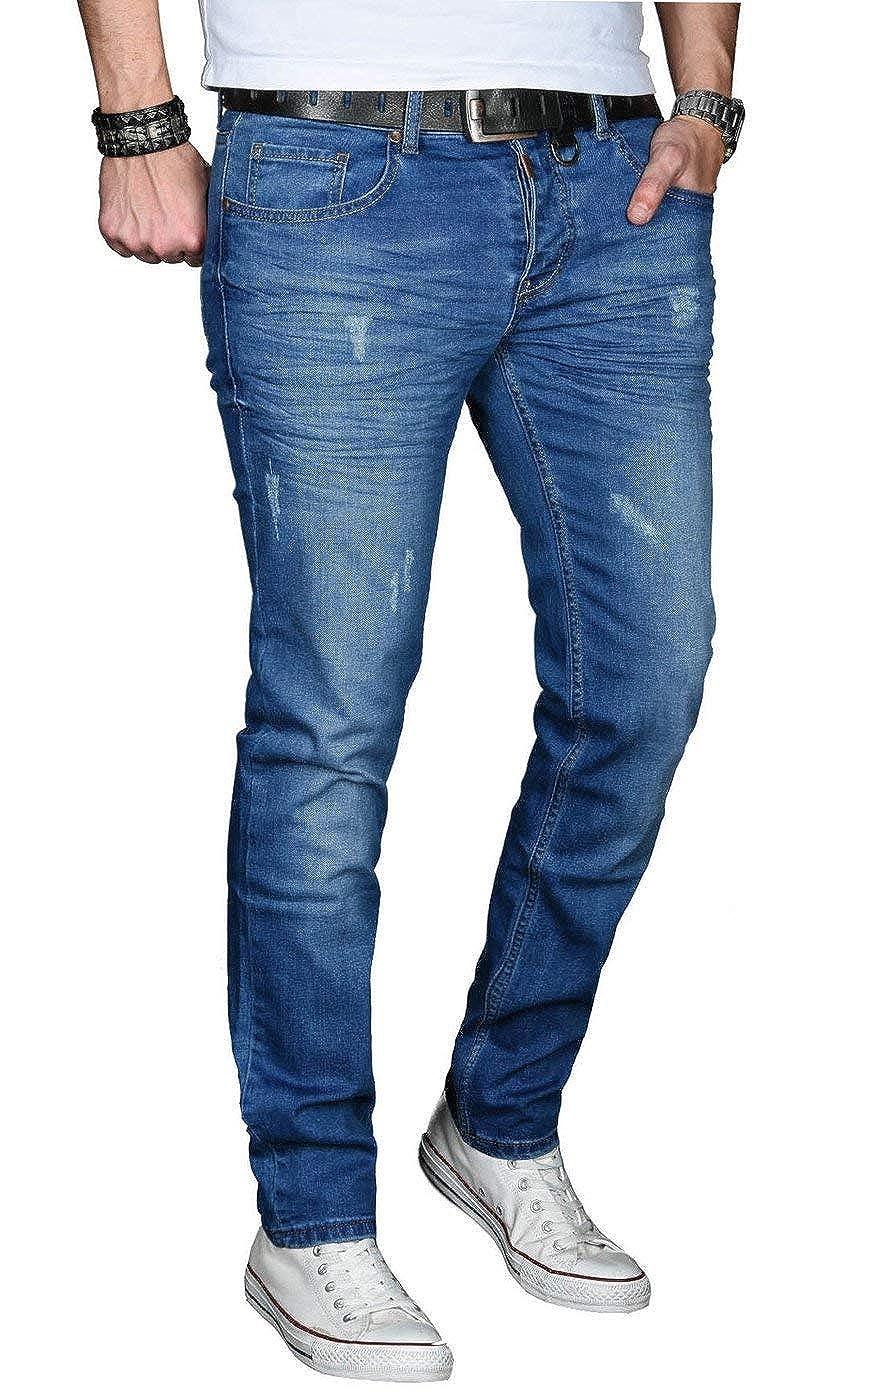 590860660db3a3 A. Salvarini Designer Herren Jeans Hose Regular Slim Fit Jeanshose Mode  Stretch  Amazon.de  Bekleidung